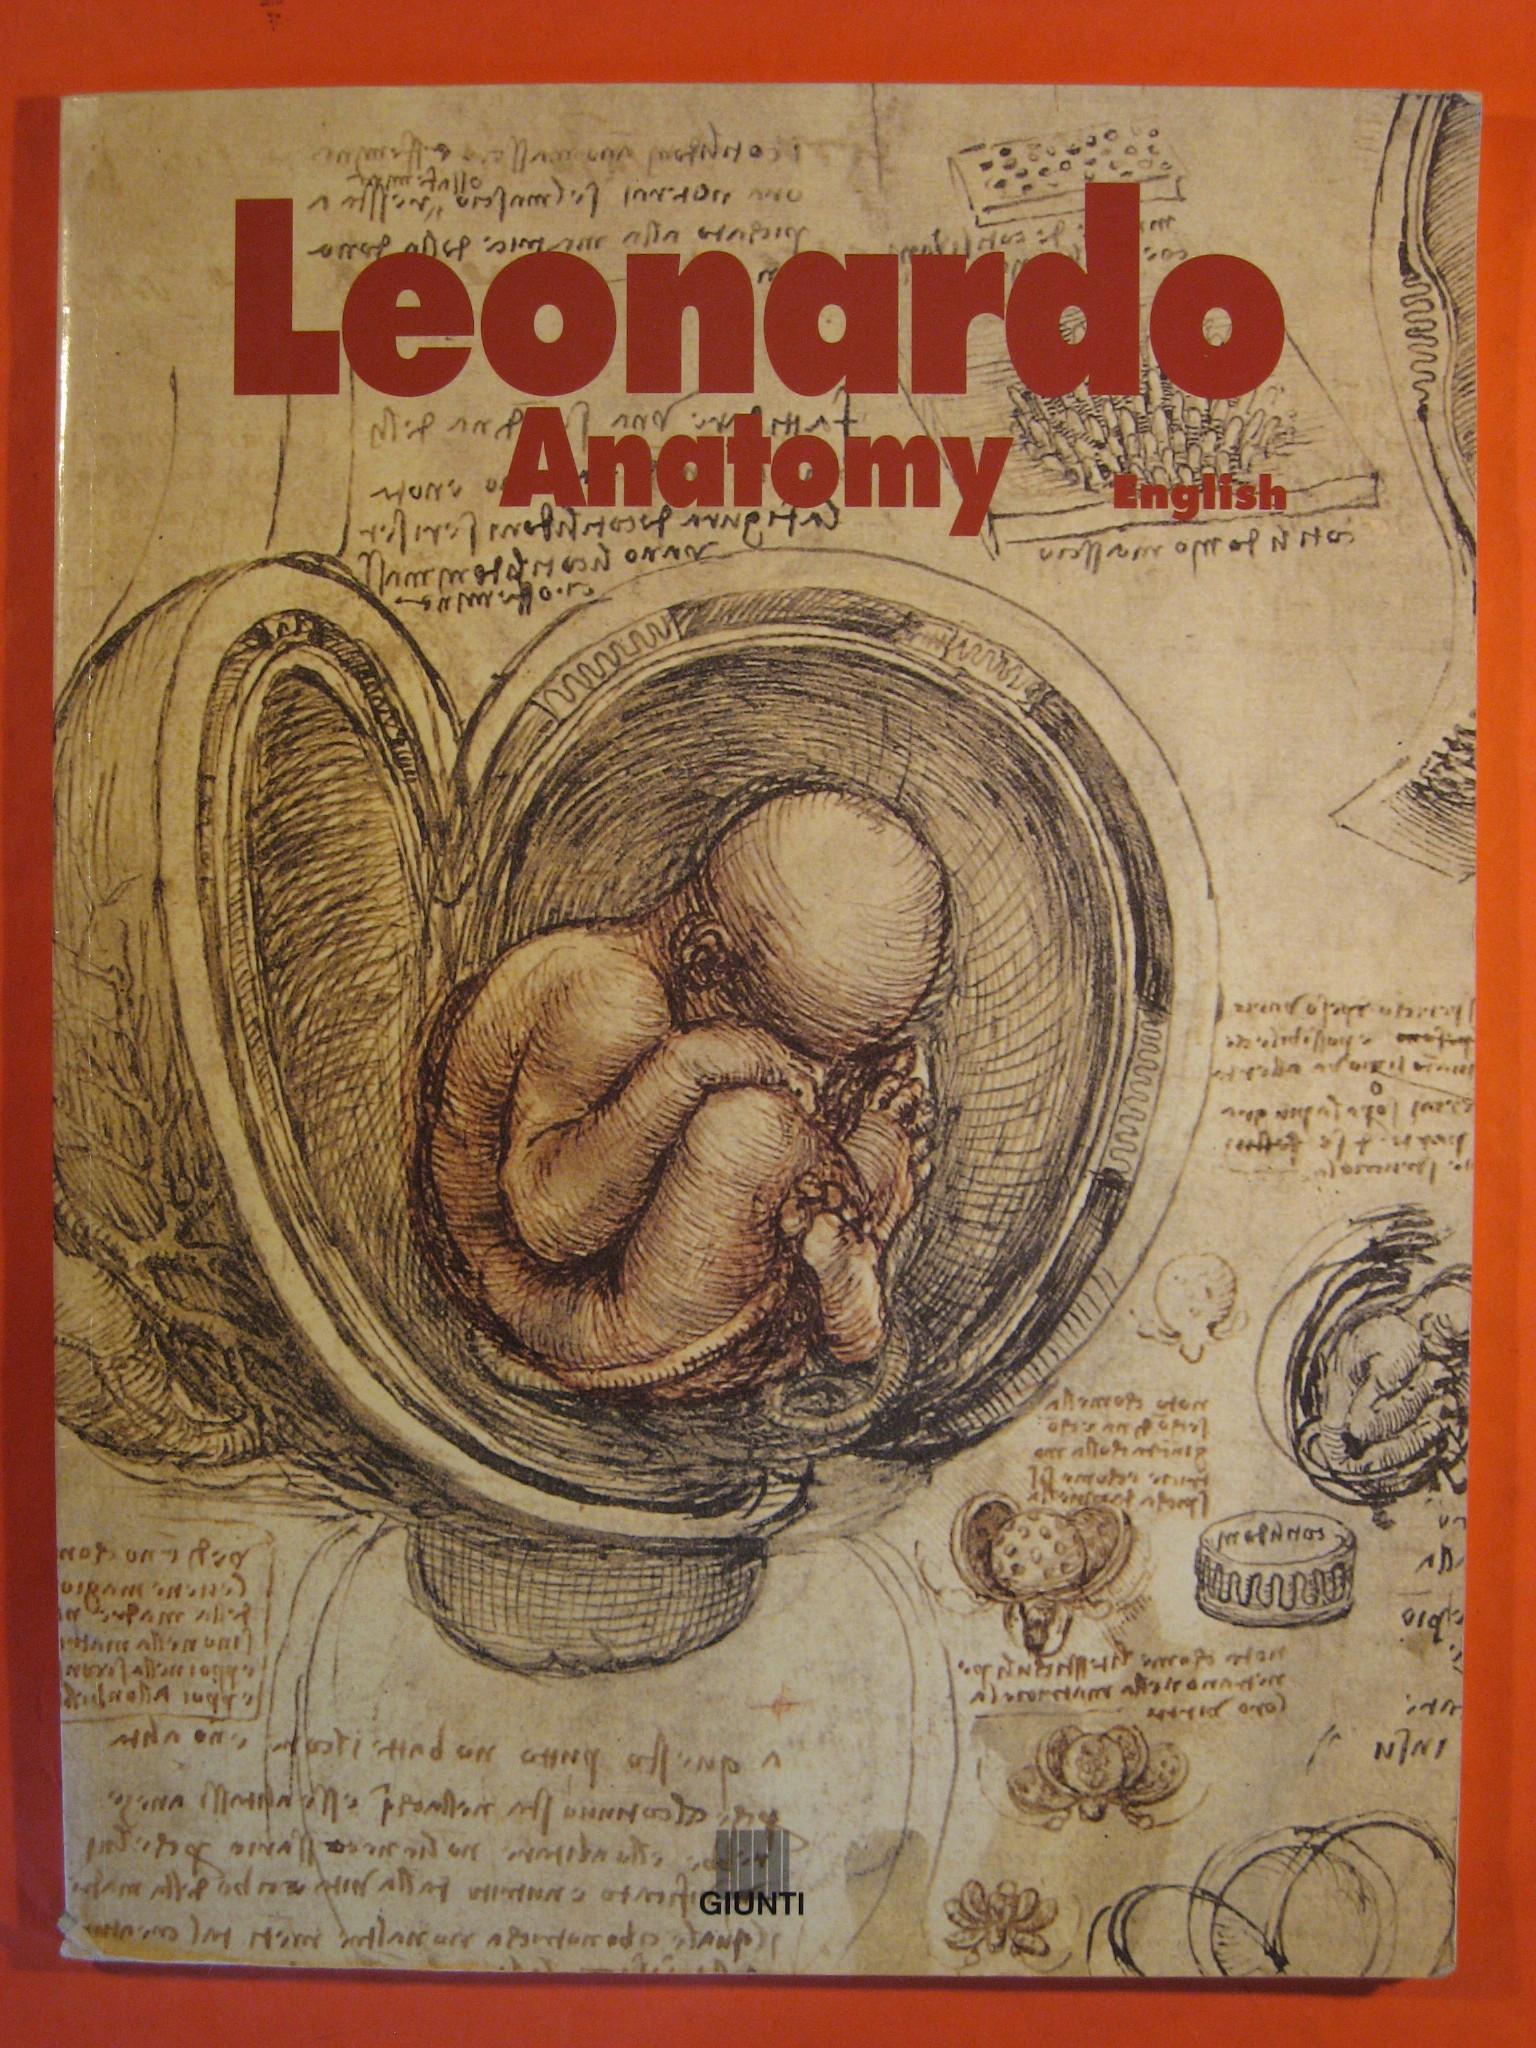 Leonardo da Vinci Anatomy of the Human Body, Da Vinci, Leonardo; Cianchi, Marco